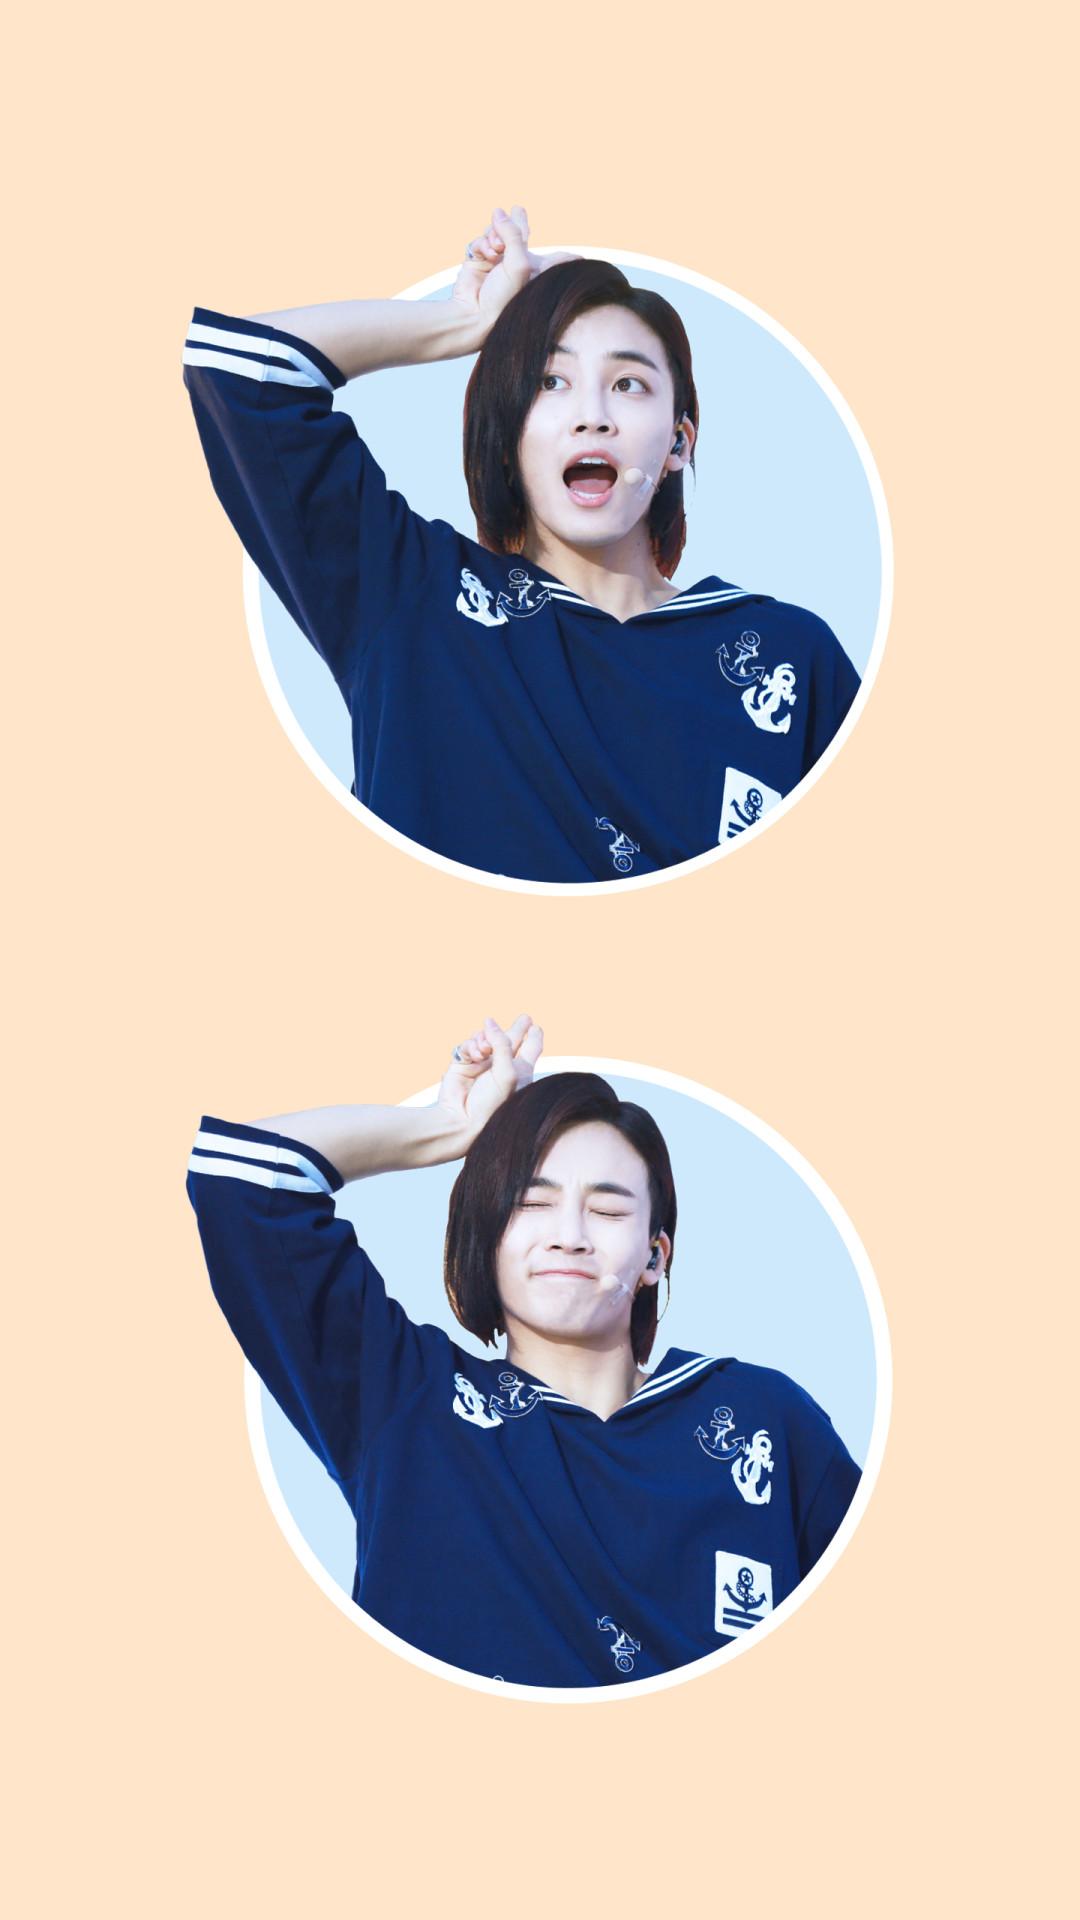 jeonghan wallpaper jeonghan lockscreen kpop wallpaper kpop lockscreen seventeen  wallpaper seventeen lockscreen jeonghan seventeen happy jeonghan